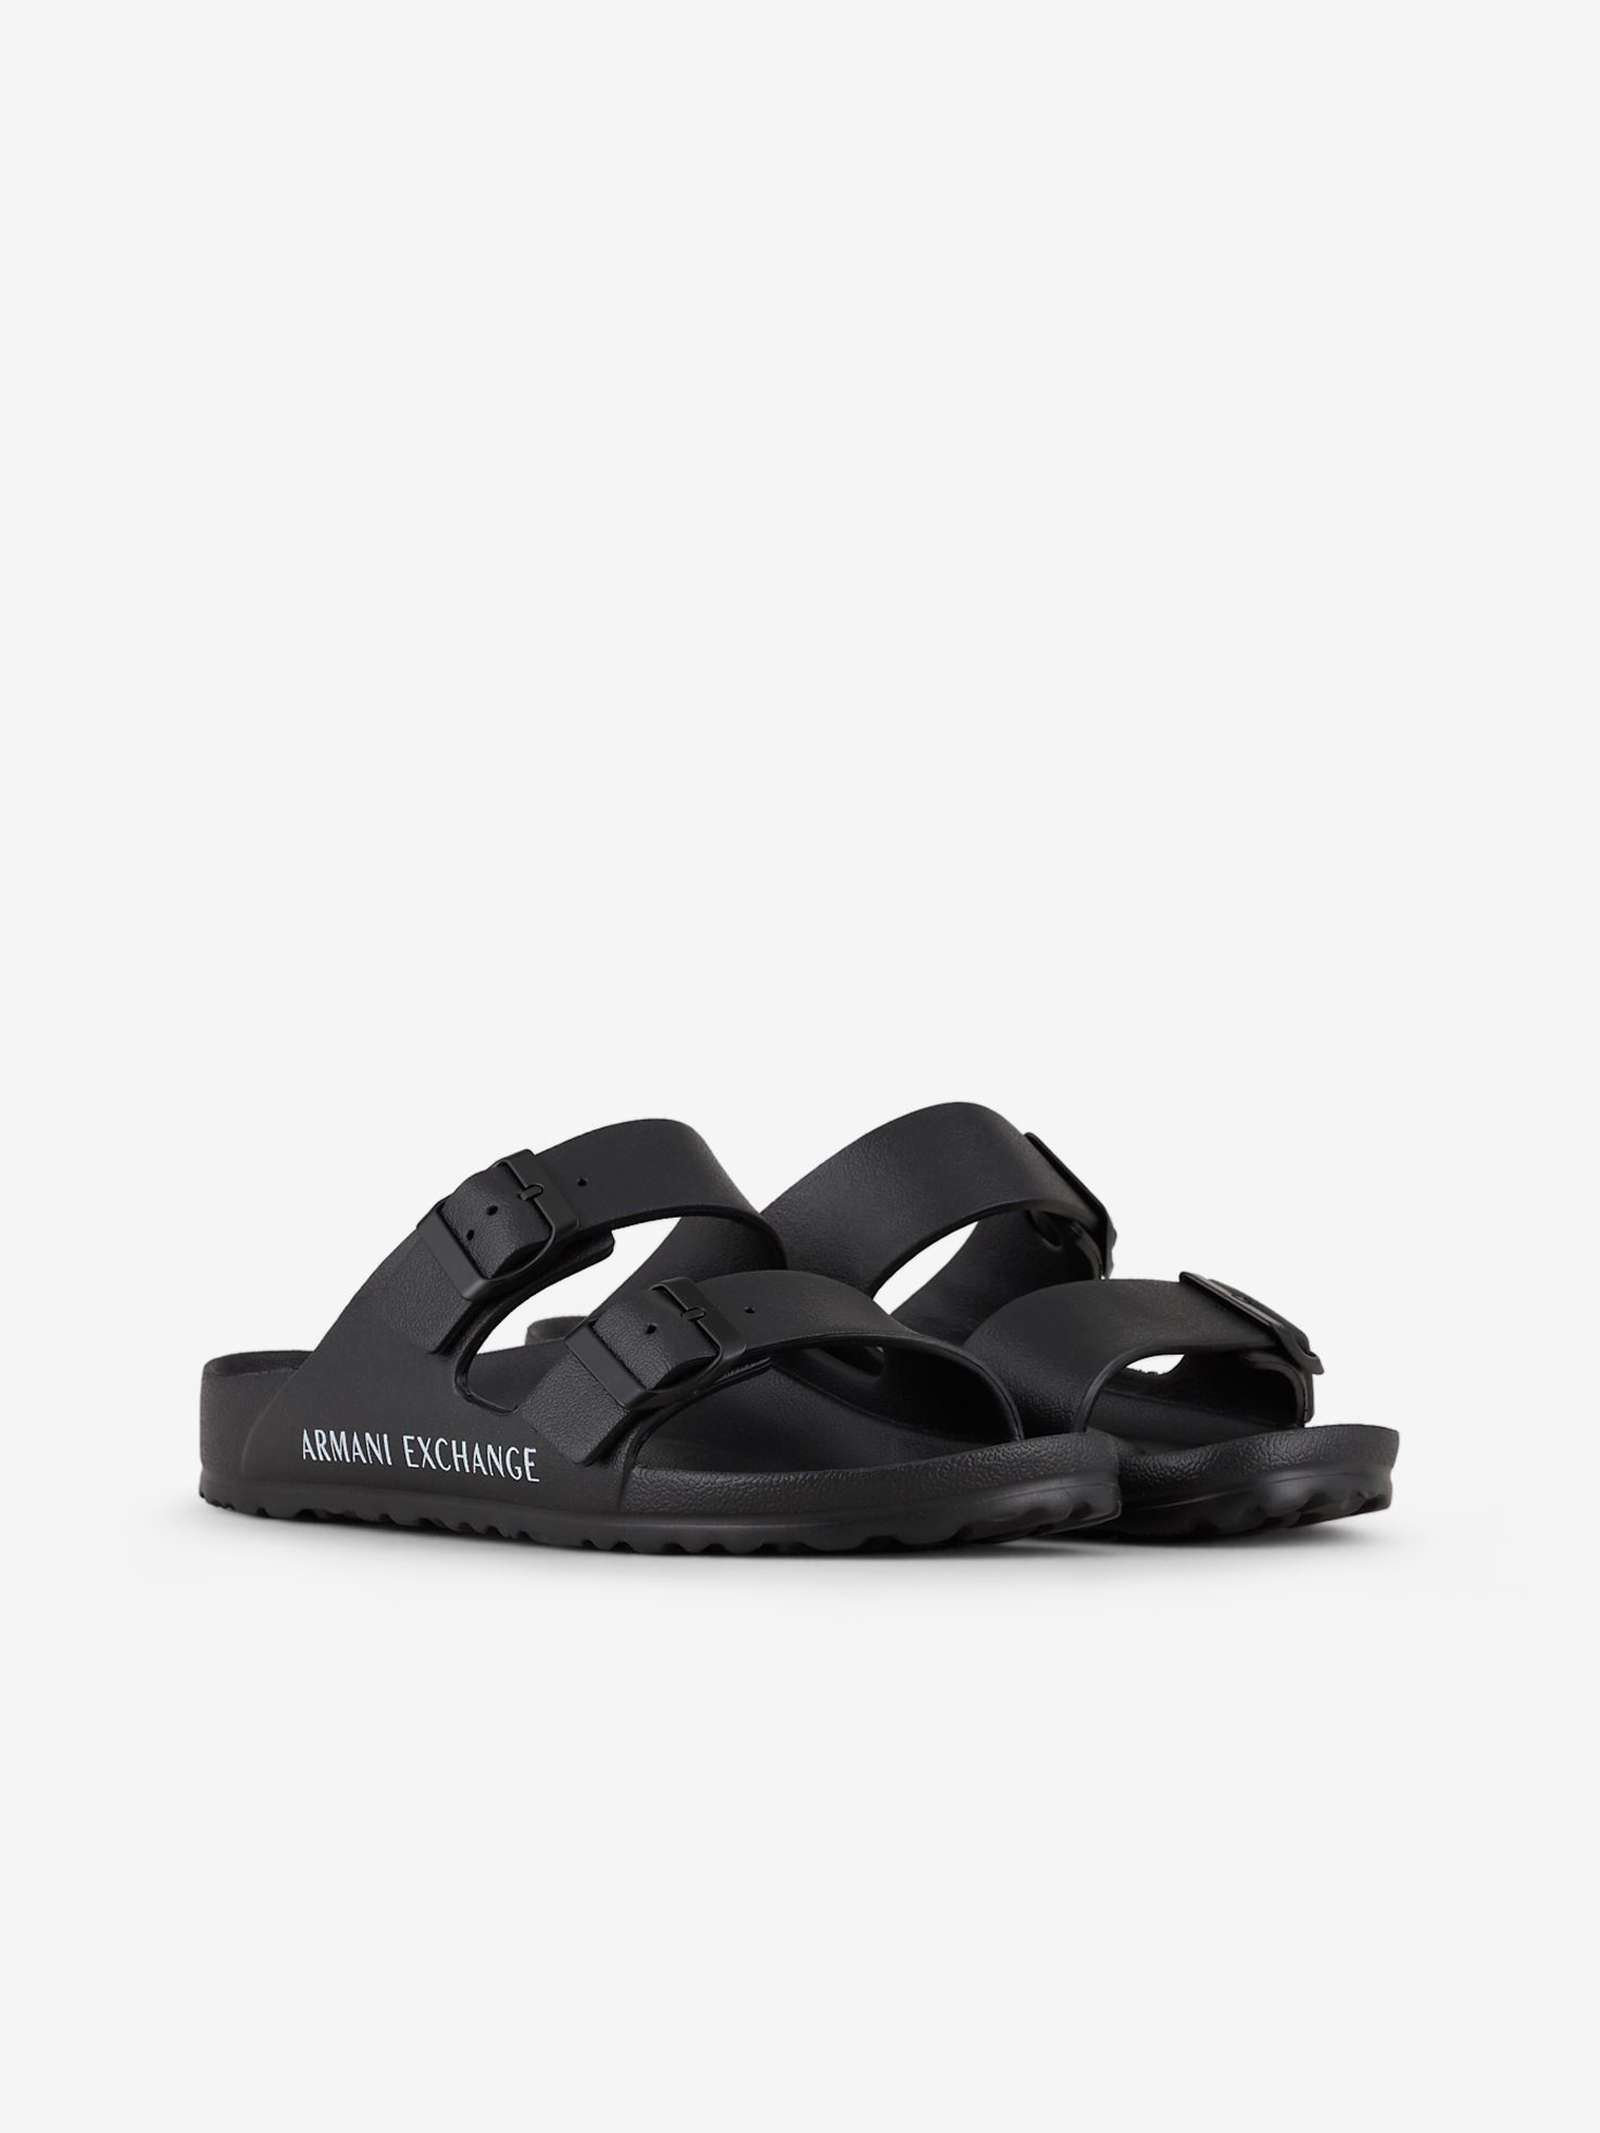 Sandali con fasce regolabili ARMANI EXCHANGE | Sandalo | XUP006/XV292N642